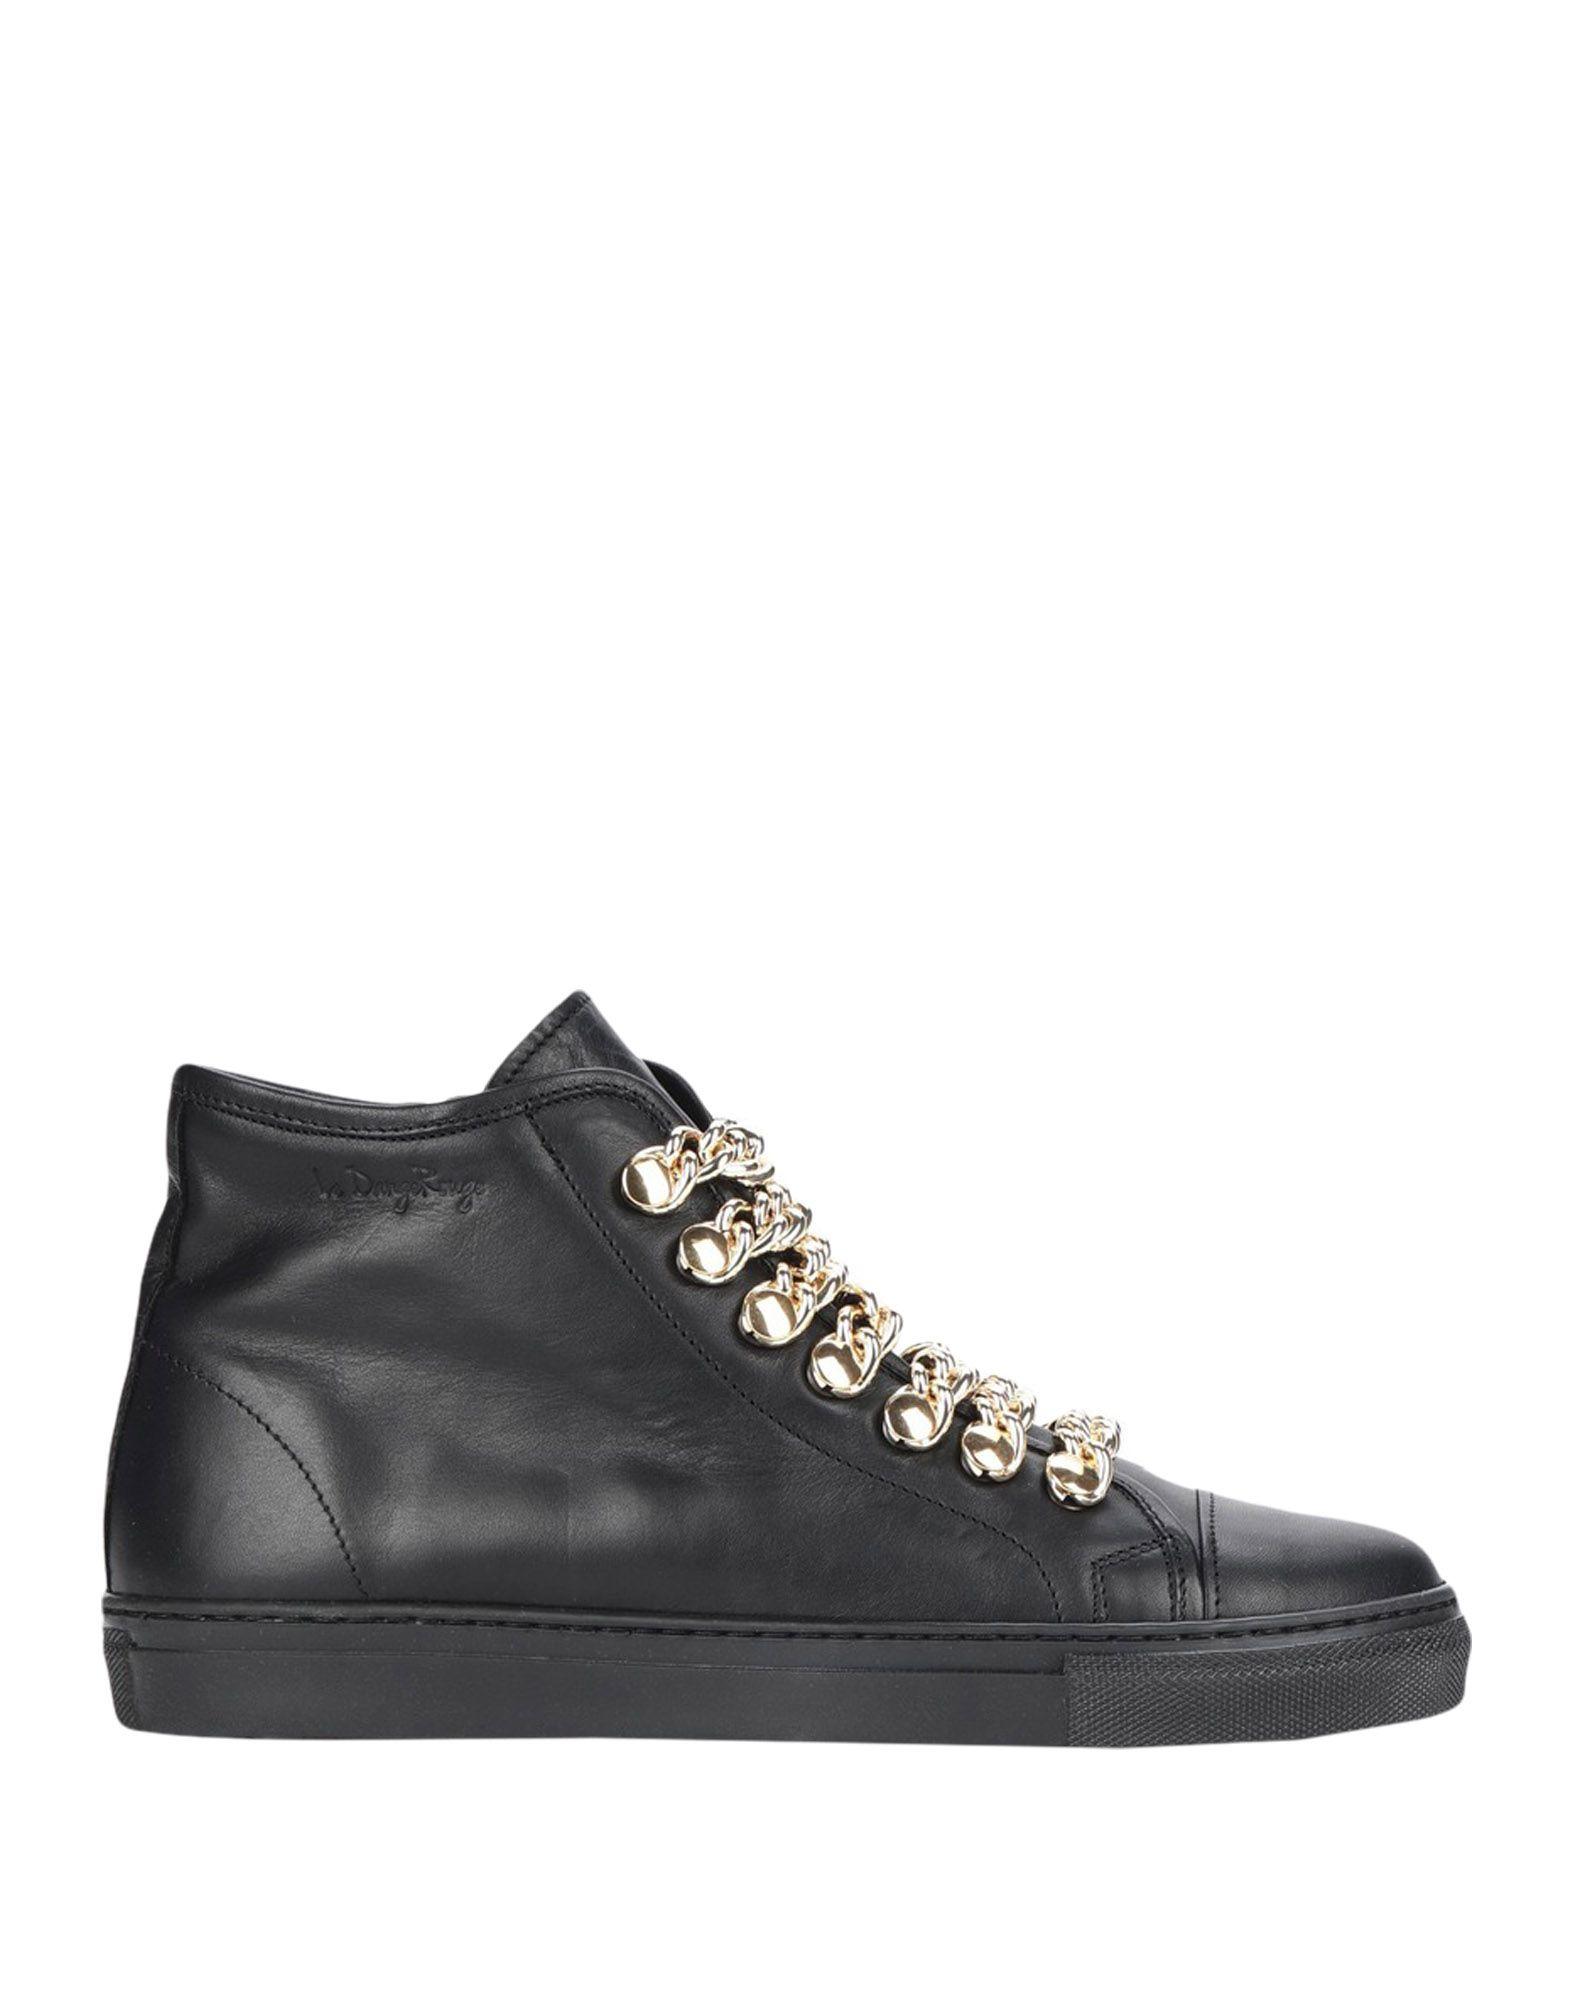 LE DANGEROUGE Высокие кеды и кроссовки кеды кроссовки высокие женские dc evan hi le brown dark chocolate